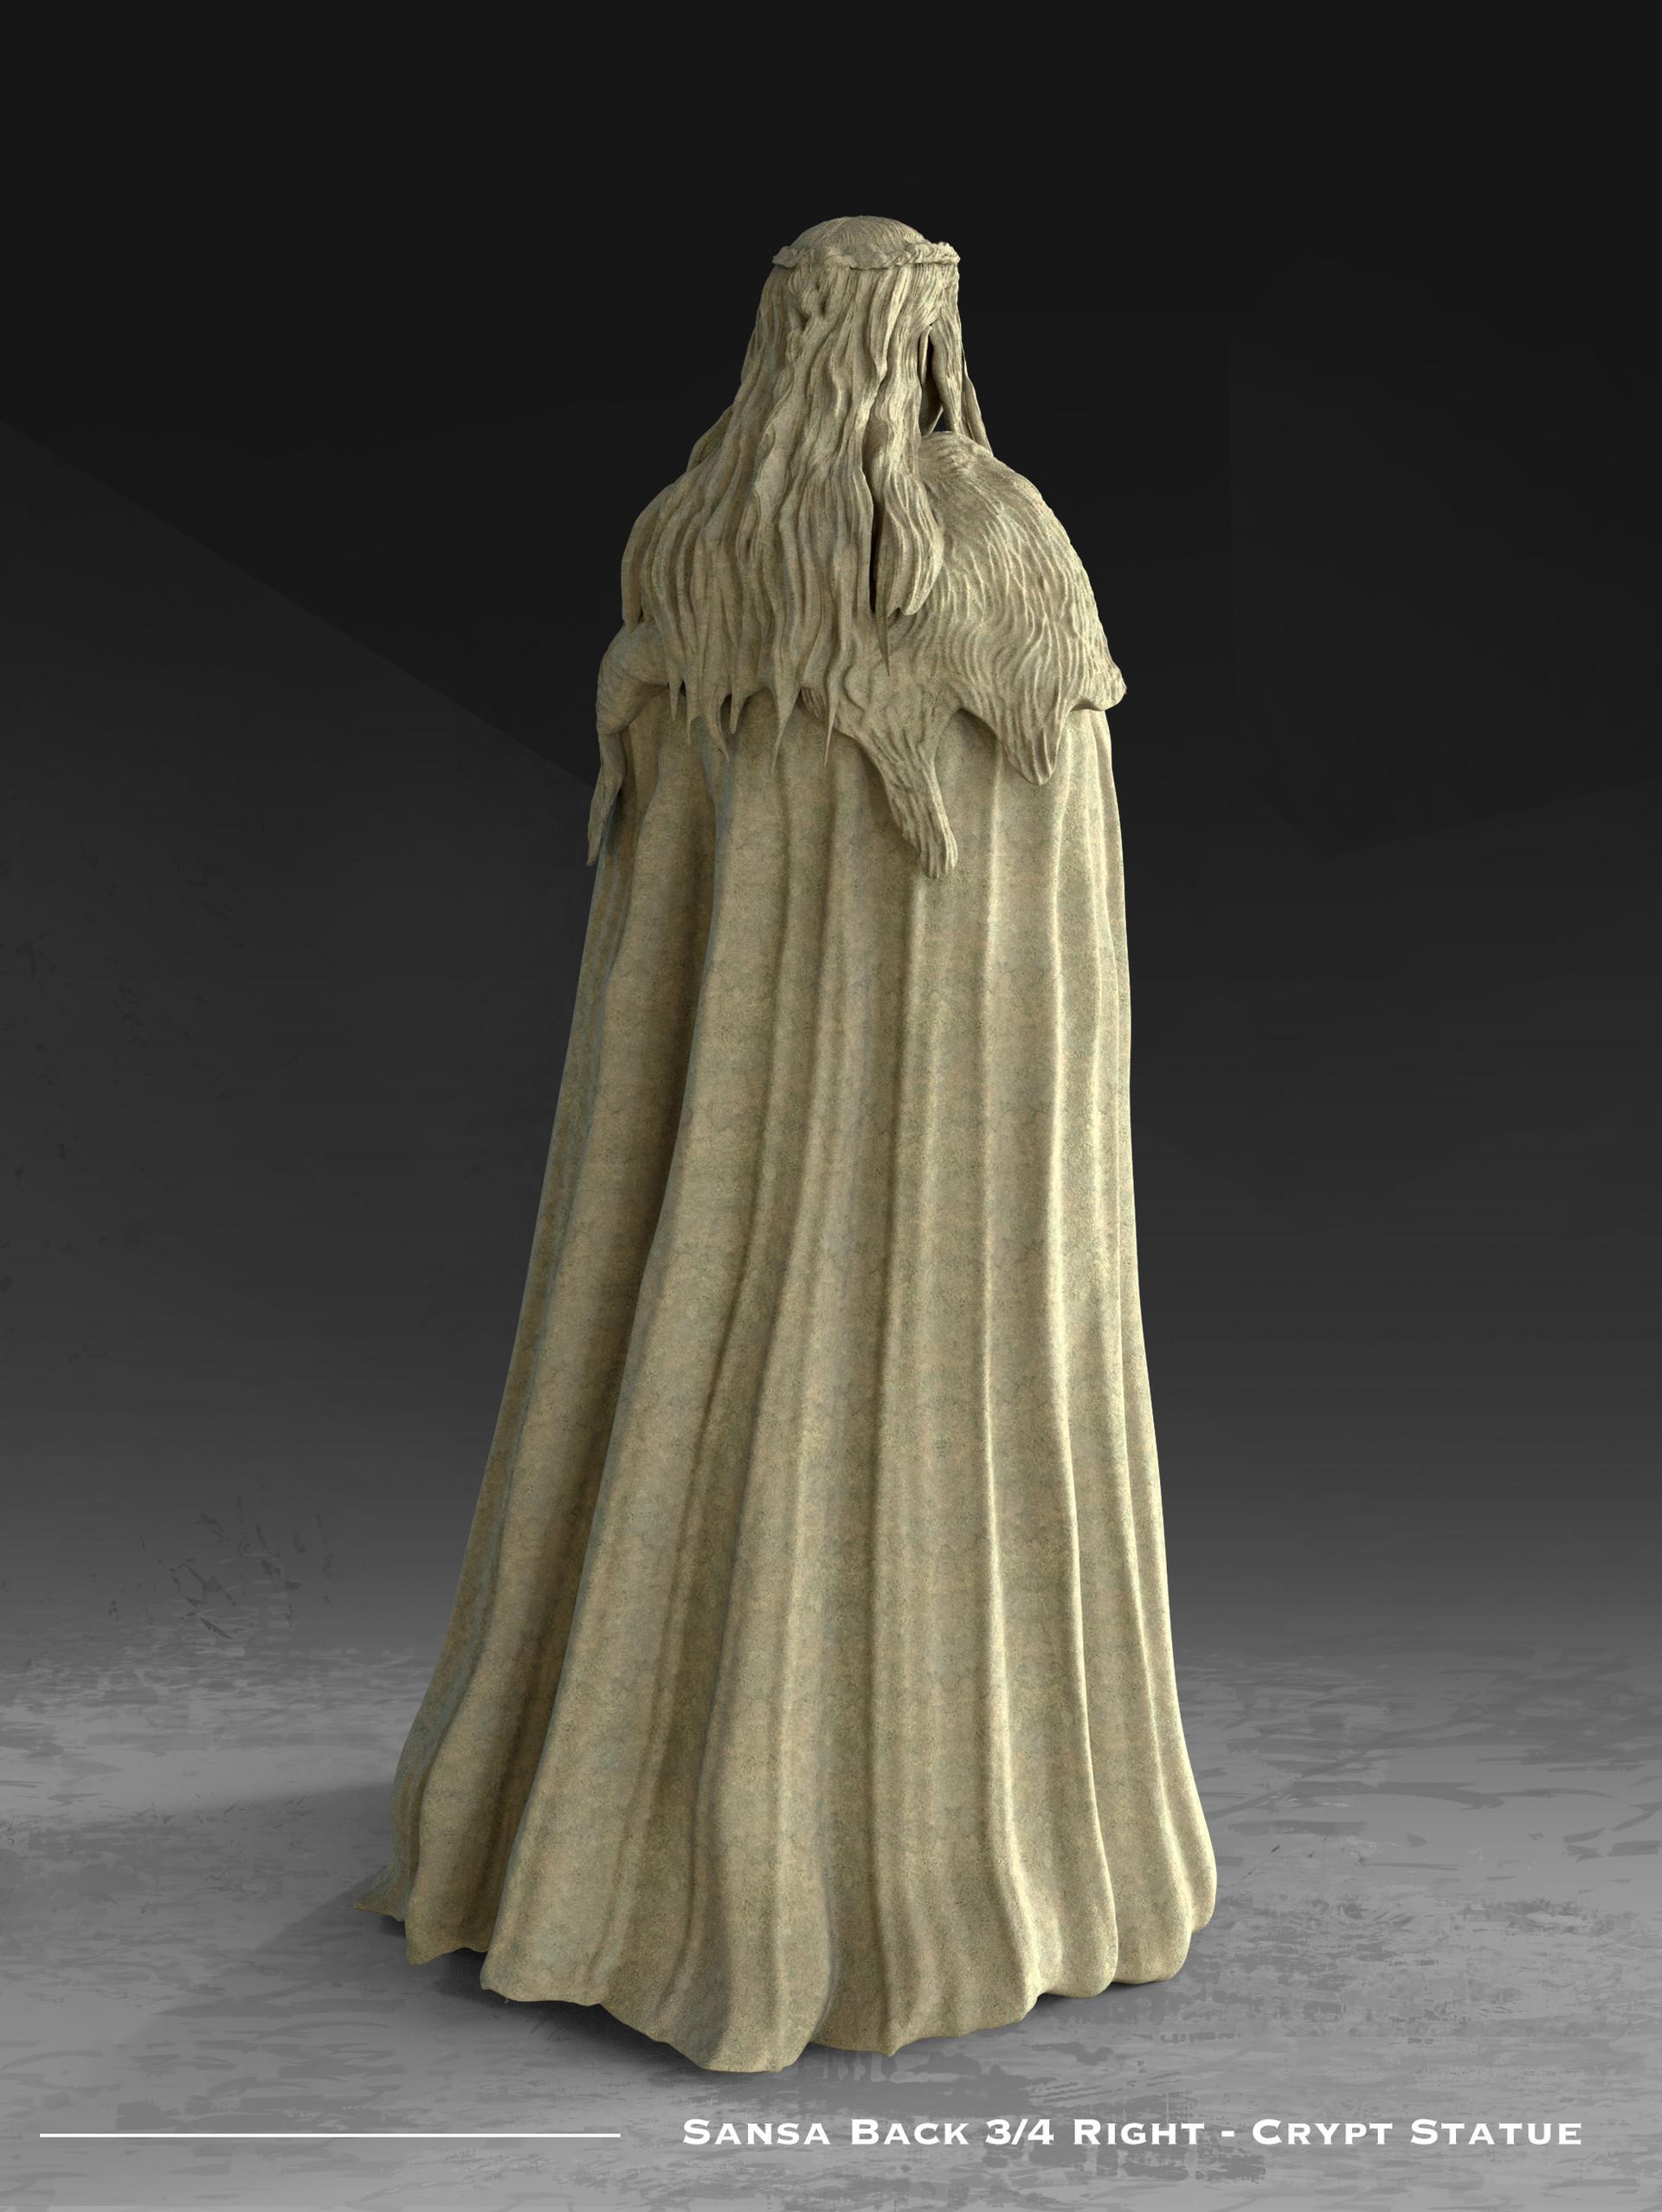 Kieran belshaw sansa statue back 3qright v001